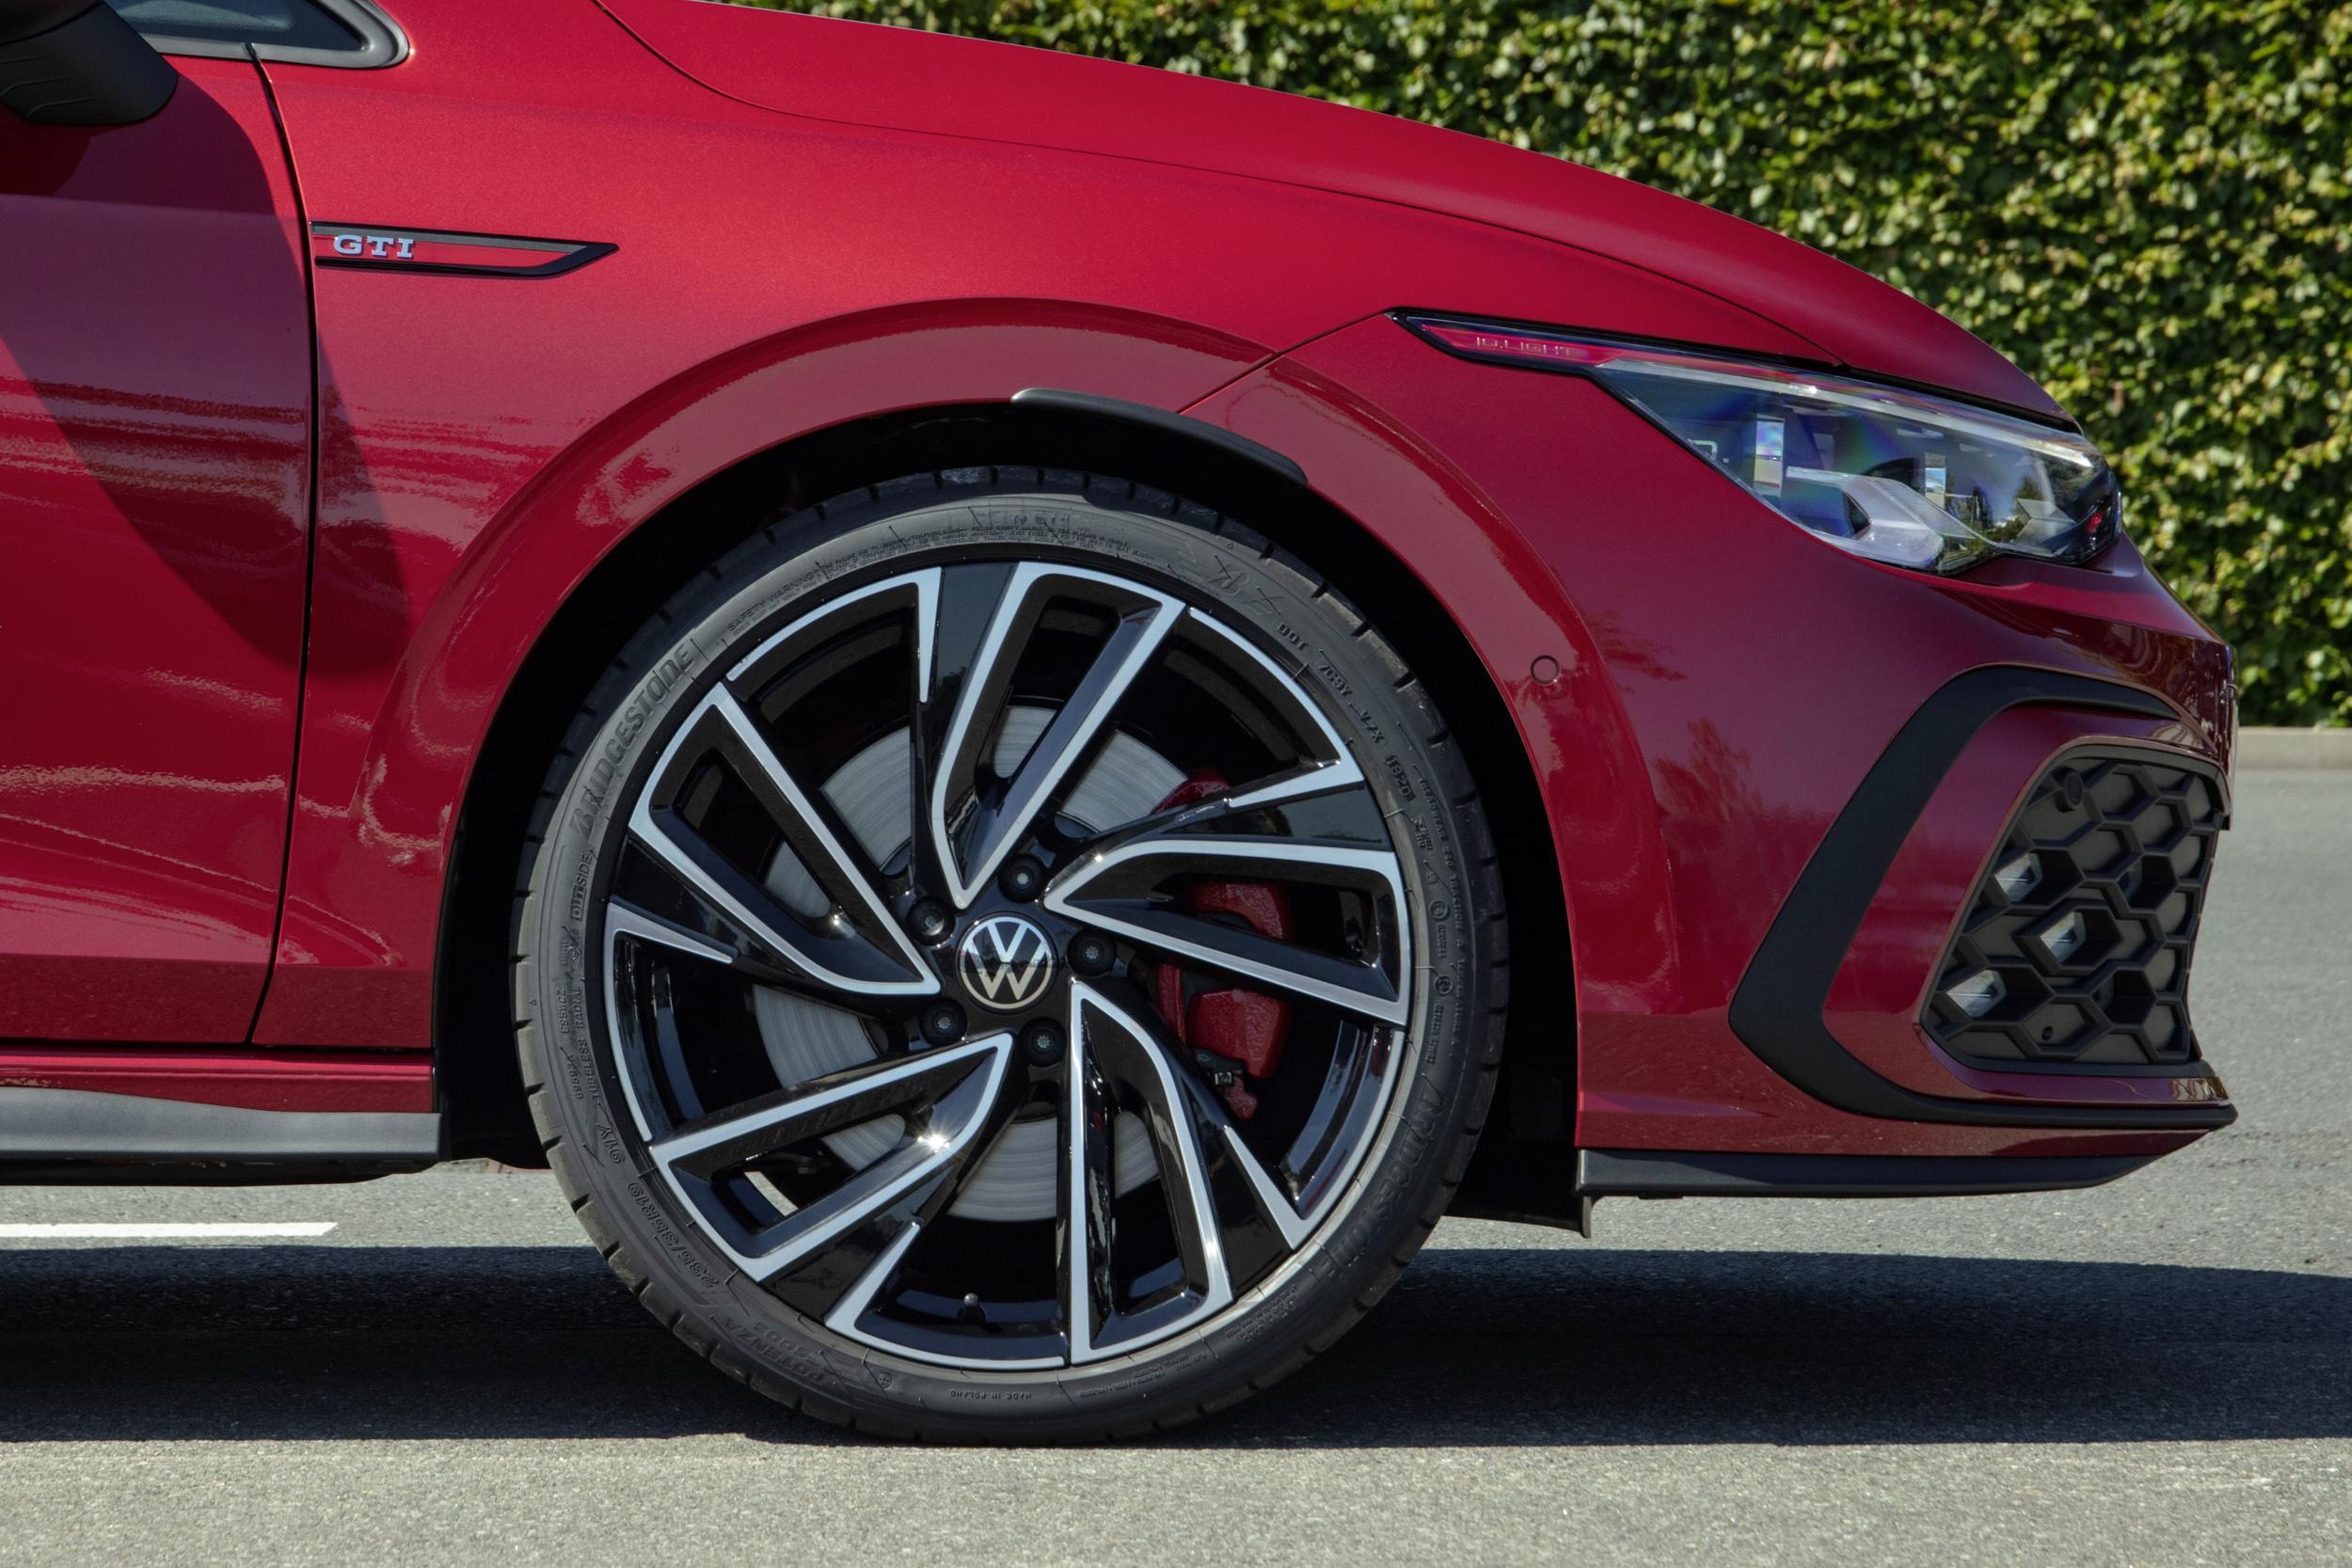 Golf 8 GTI配有19吋專屬鋁圈和GTI專屬高性能紅色煞車卡鉗。